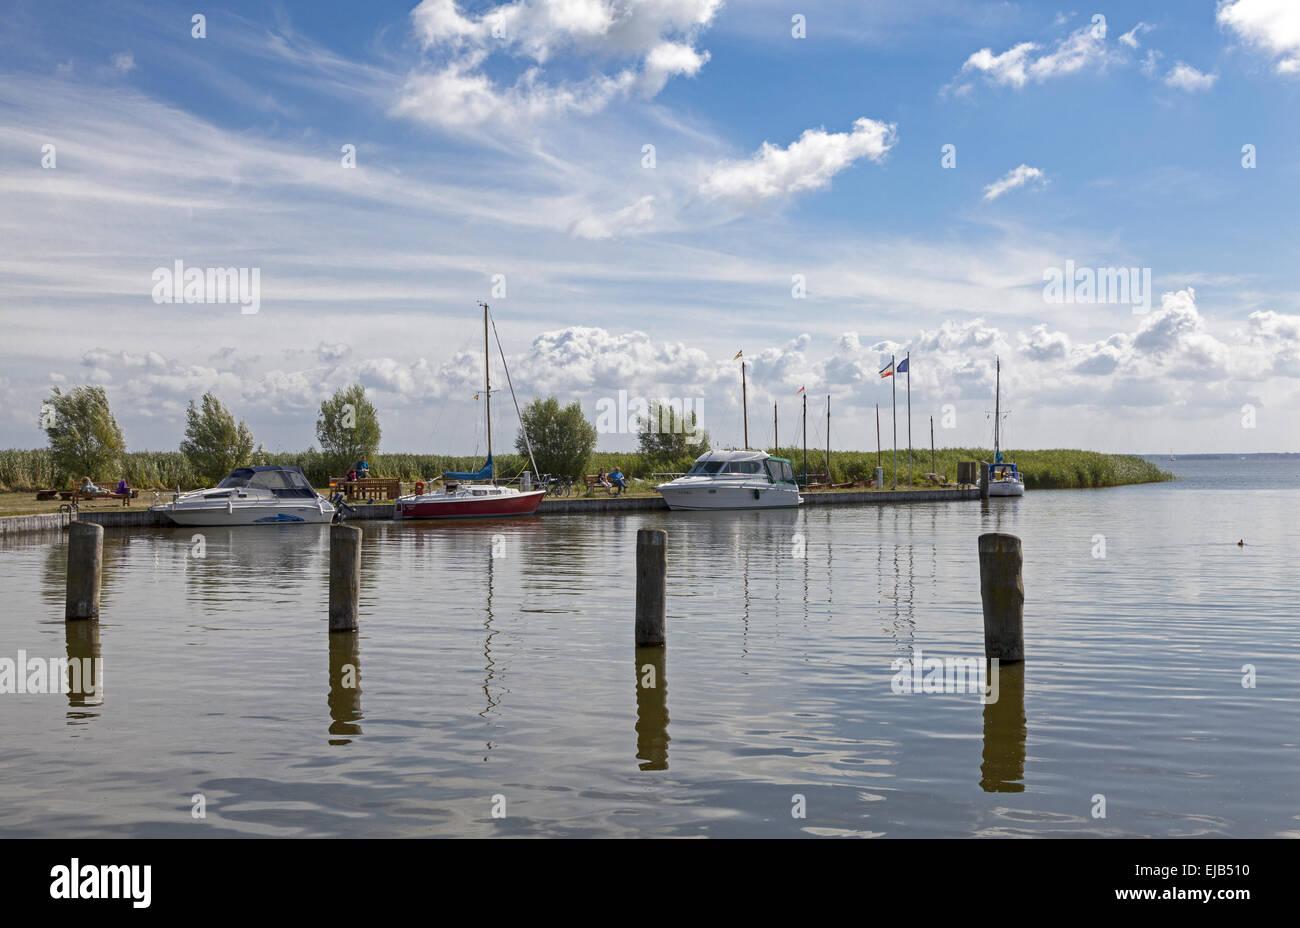 Port Altenhagen - Stock Image